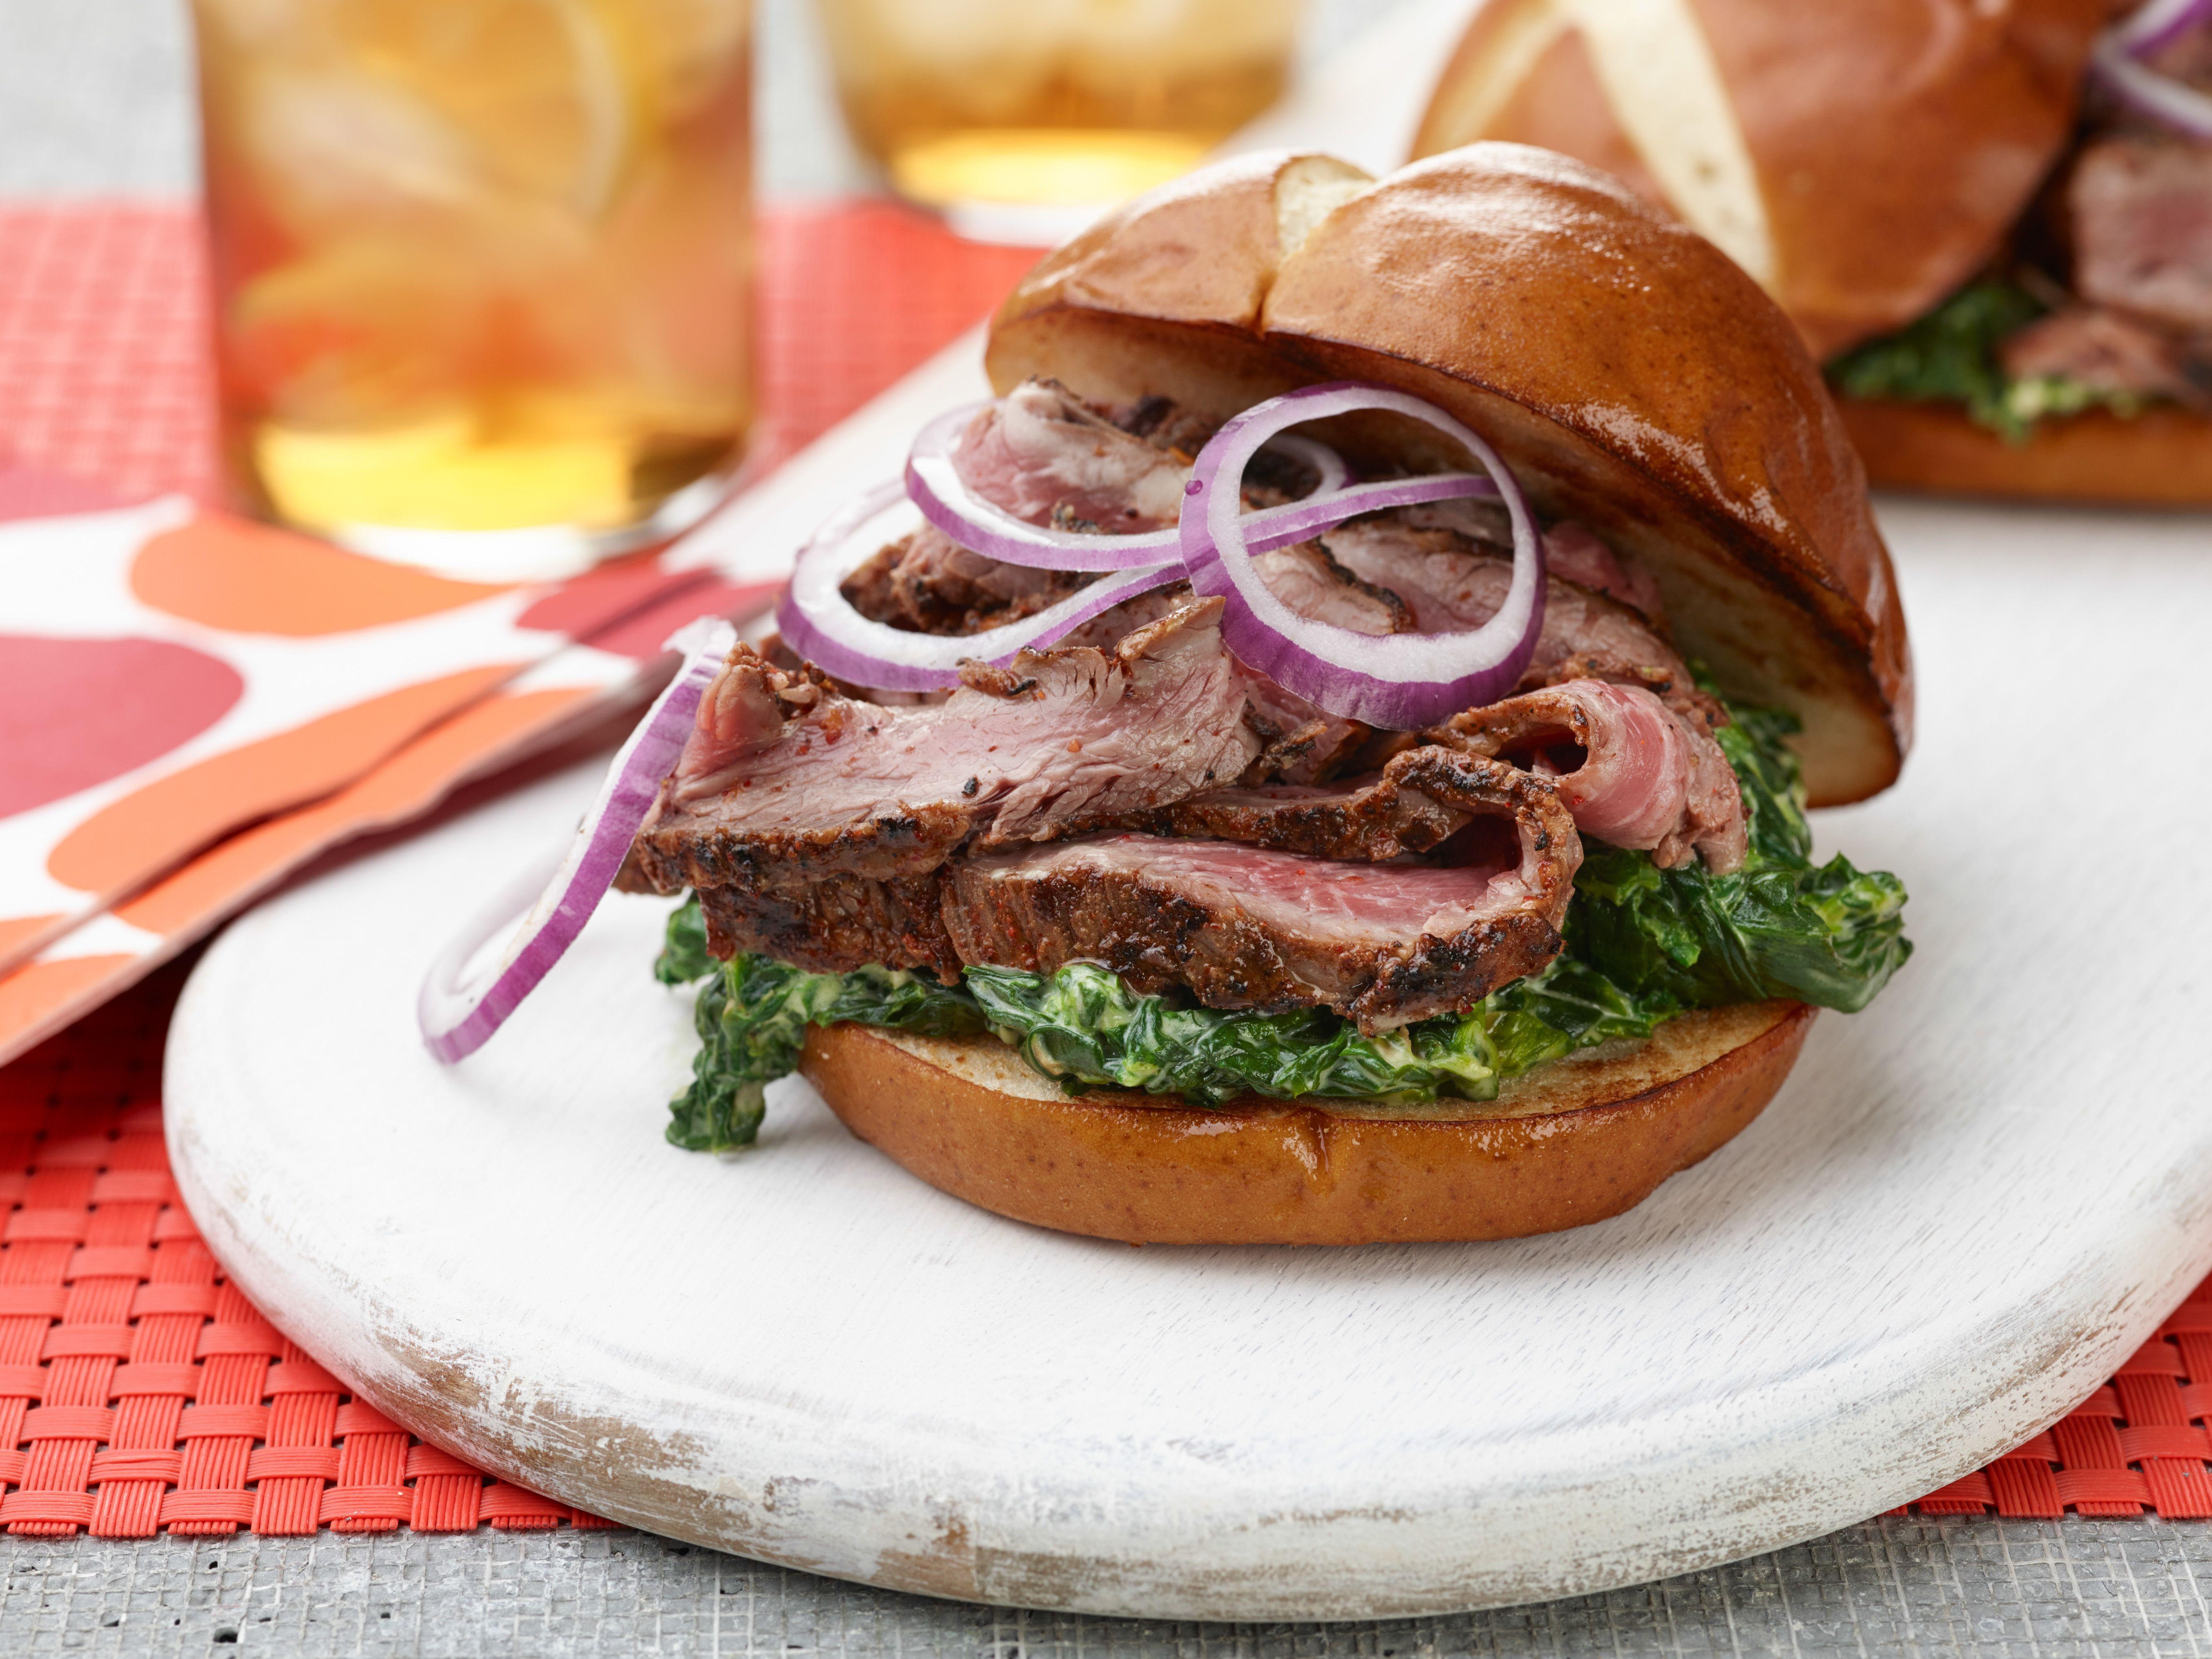 Hanger steak sandwich with bourbon creamed spinach recipe hanger steak sandwich with bourbon creamed spinach forumfinder Image collections